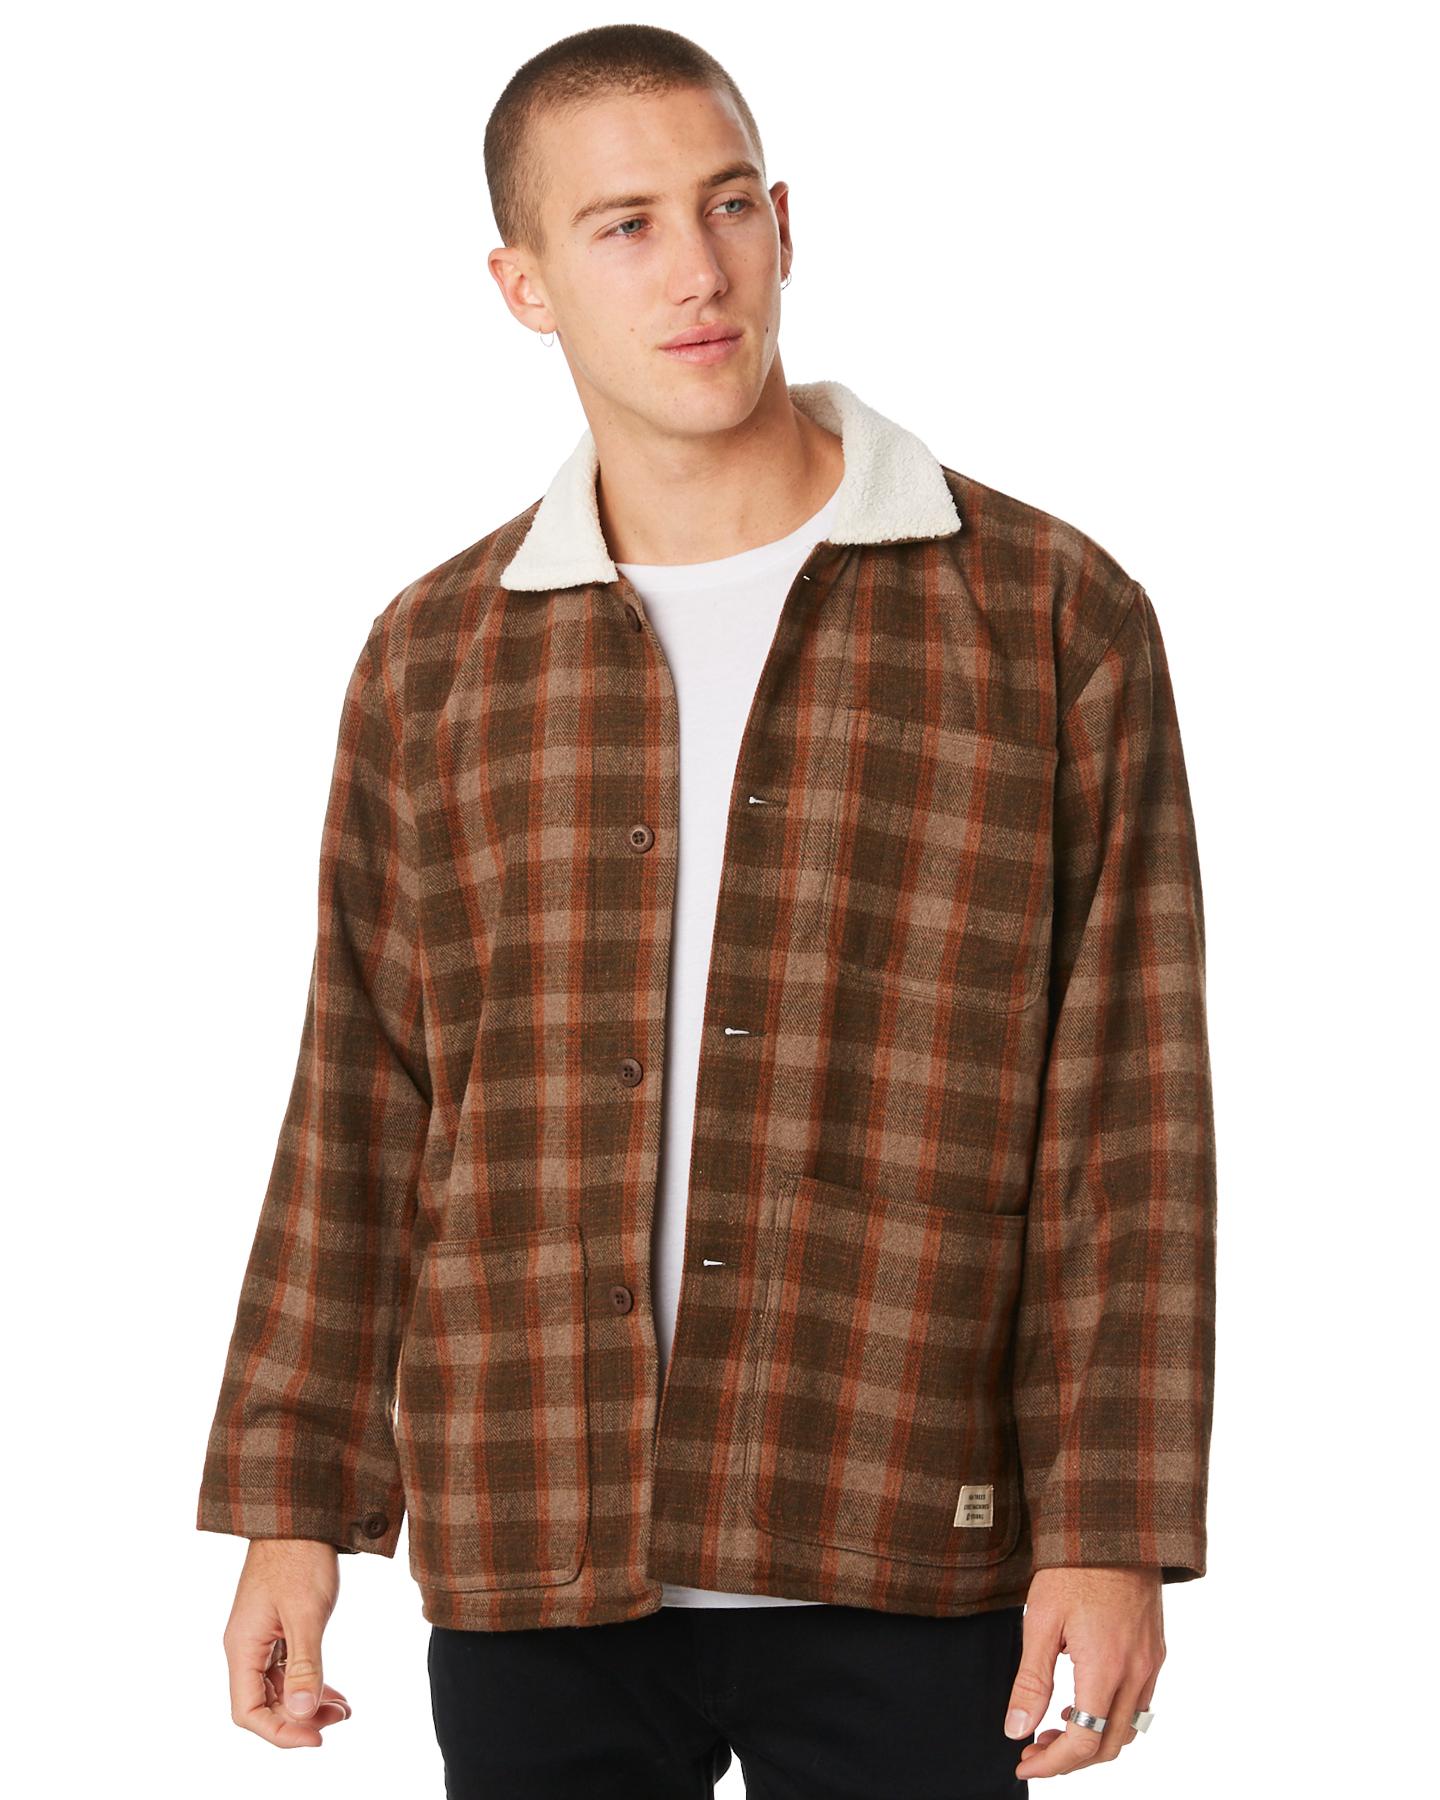 6a3b4fa385 Insight Lumber City Mens Jacket Brown _Mens Jackets Size S | Budget ...